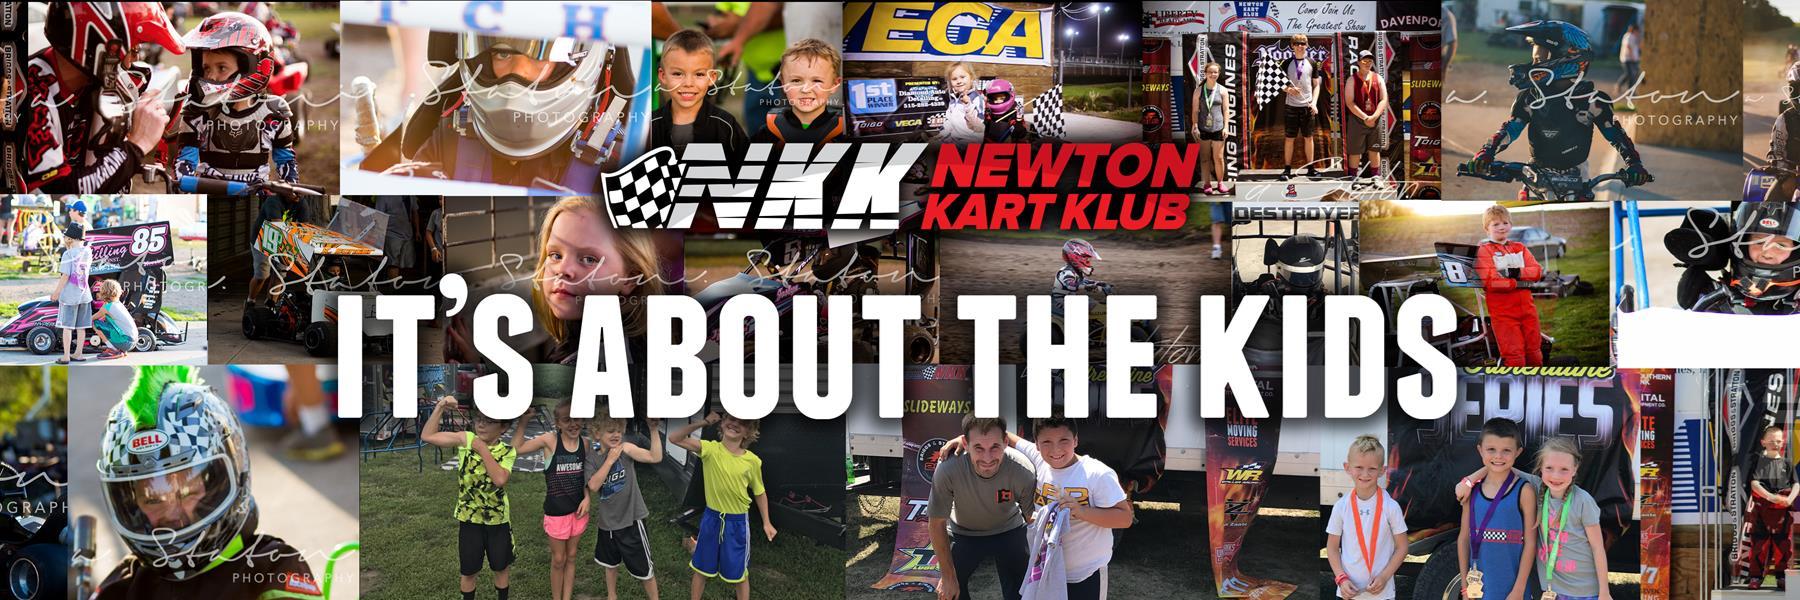 9/25/2021 - Newton Kart Klub